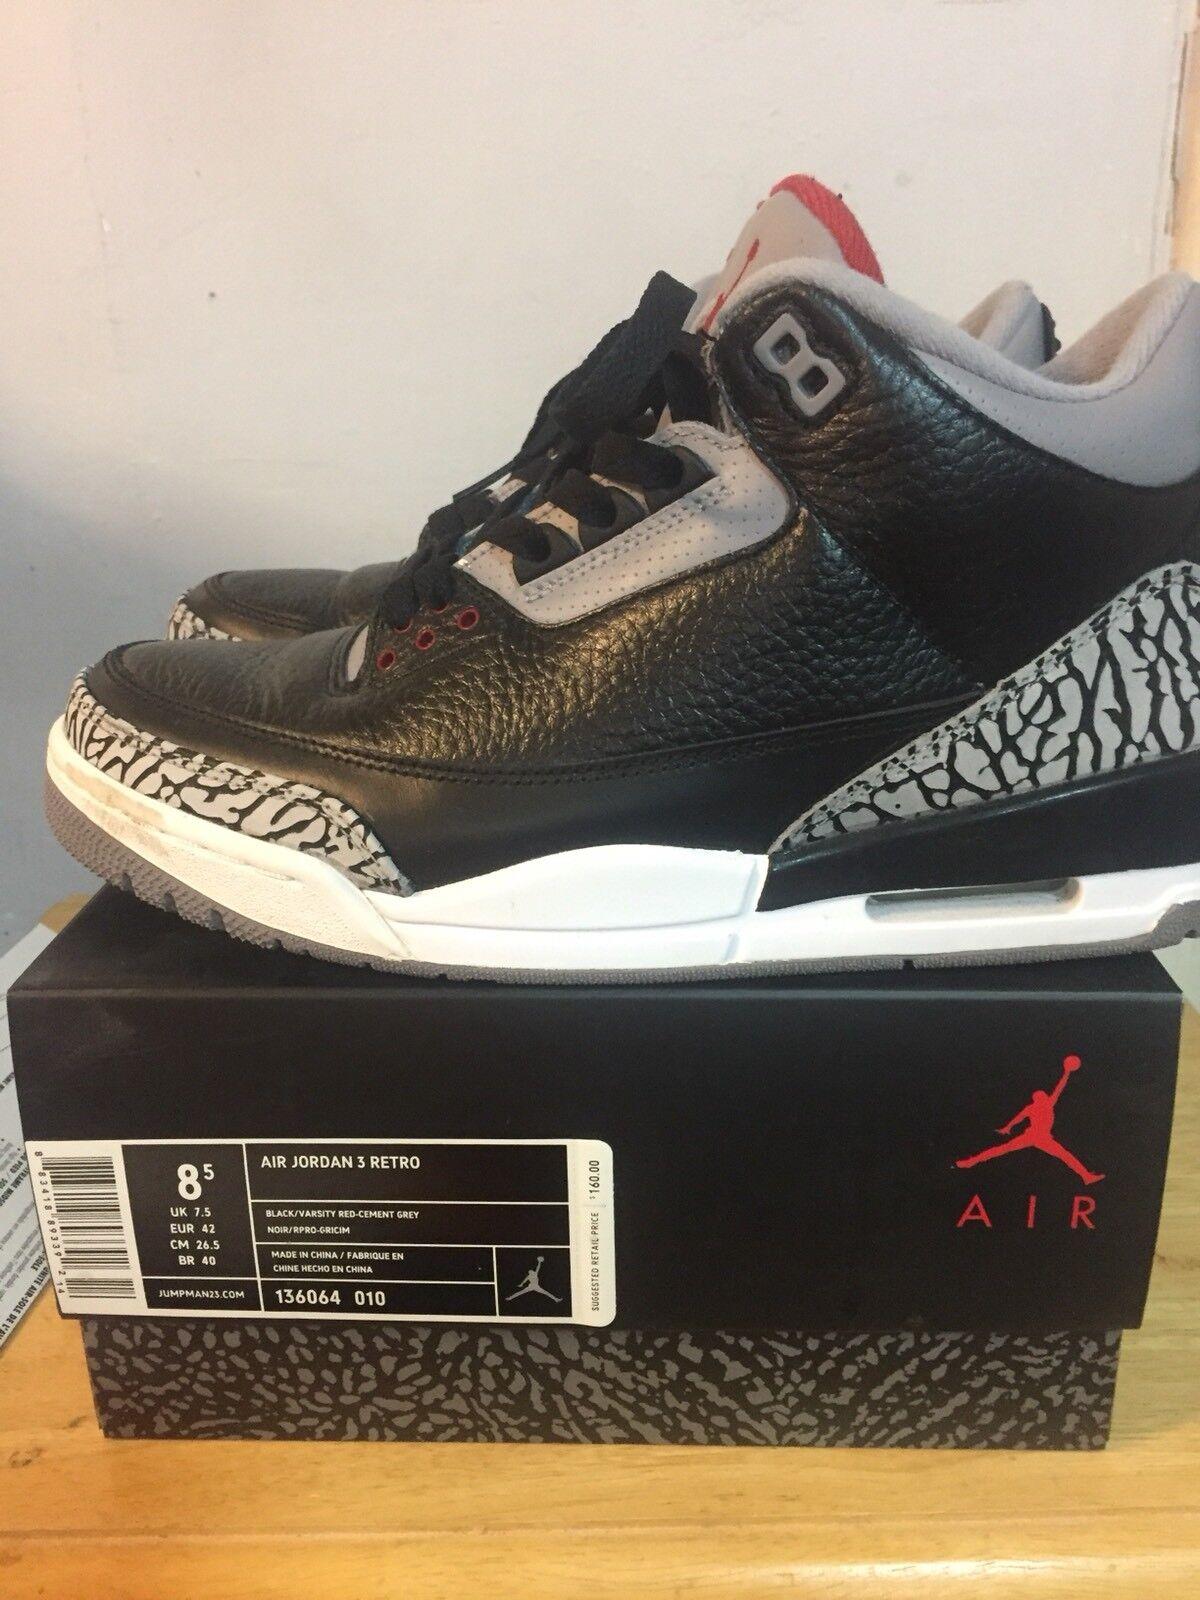 Nike Air Jordan 3 Negro Cement 8.5 III temporada 2018 SZ 8.5 Cement despacho venta ab3154